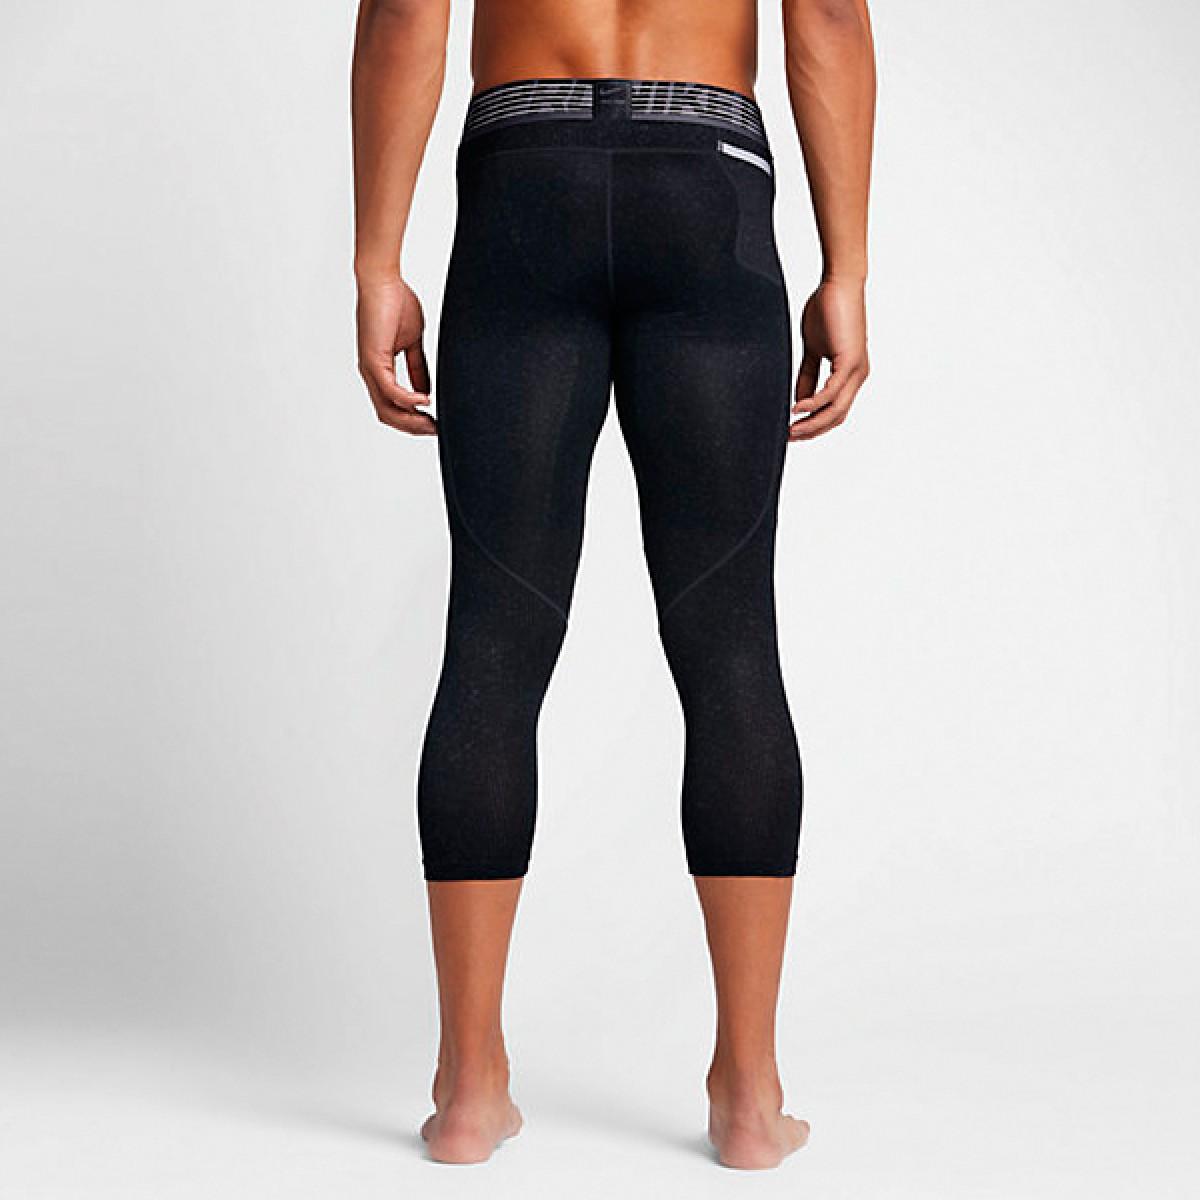 Nike Pro Hypercool Tight 'Black' 830628-010